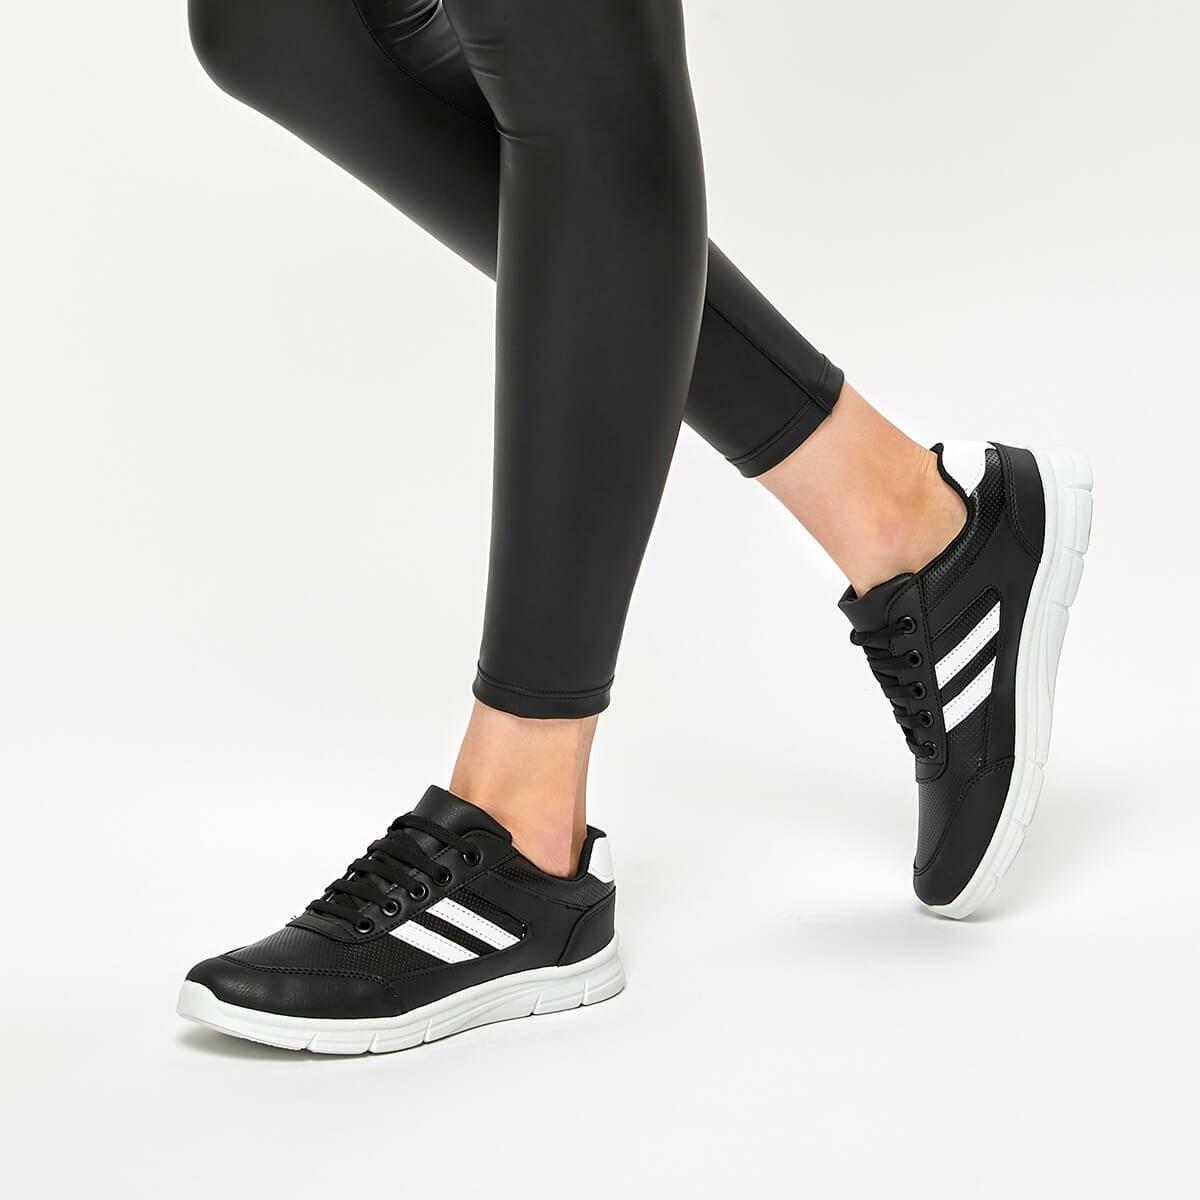 FLO 92.314871.Z Black Women Sneaker Polaris